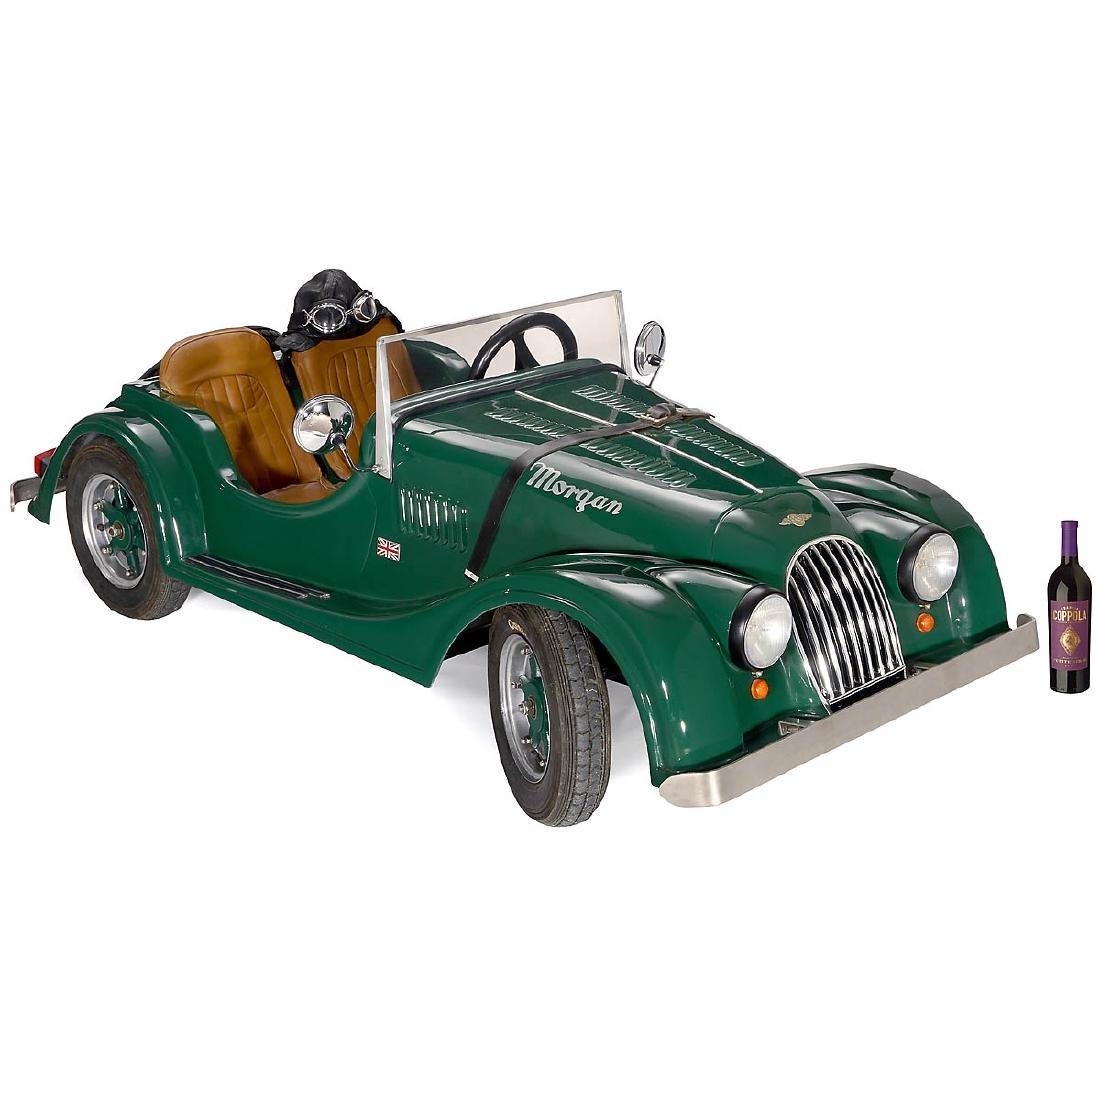 Morgan Plus 8 1:2 Scale Child's Car